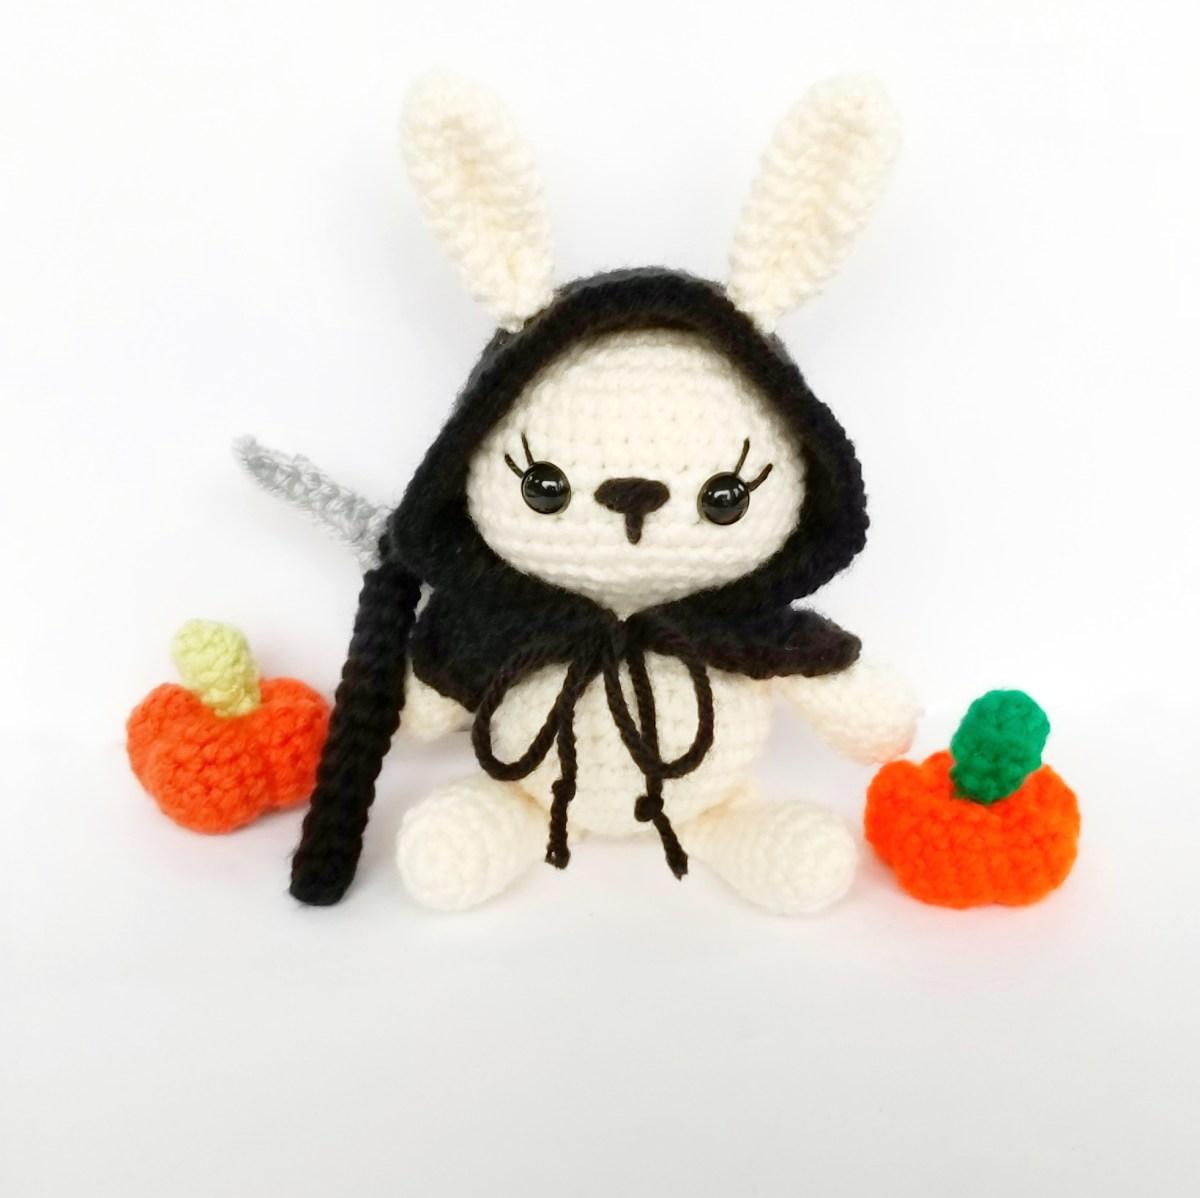 The Grim Bunny